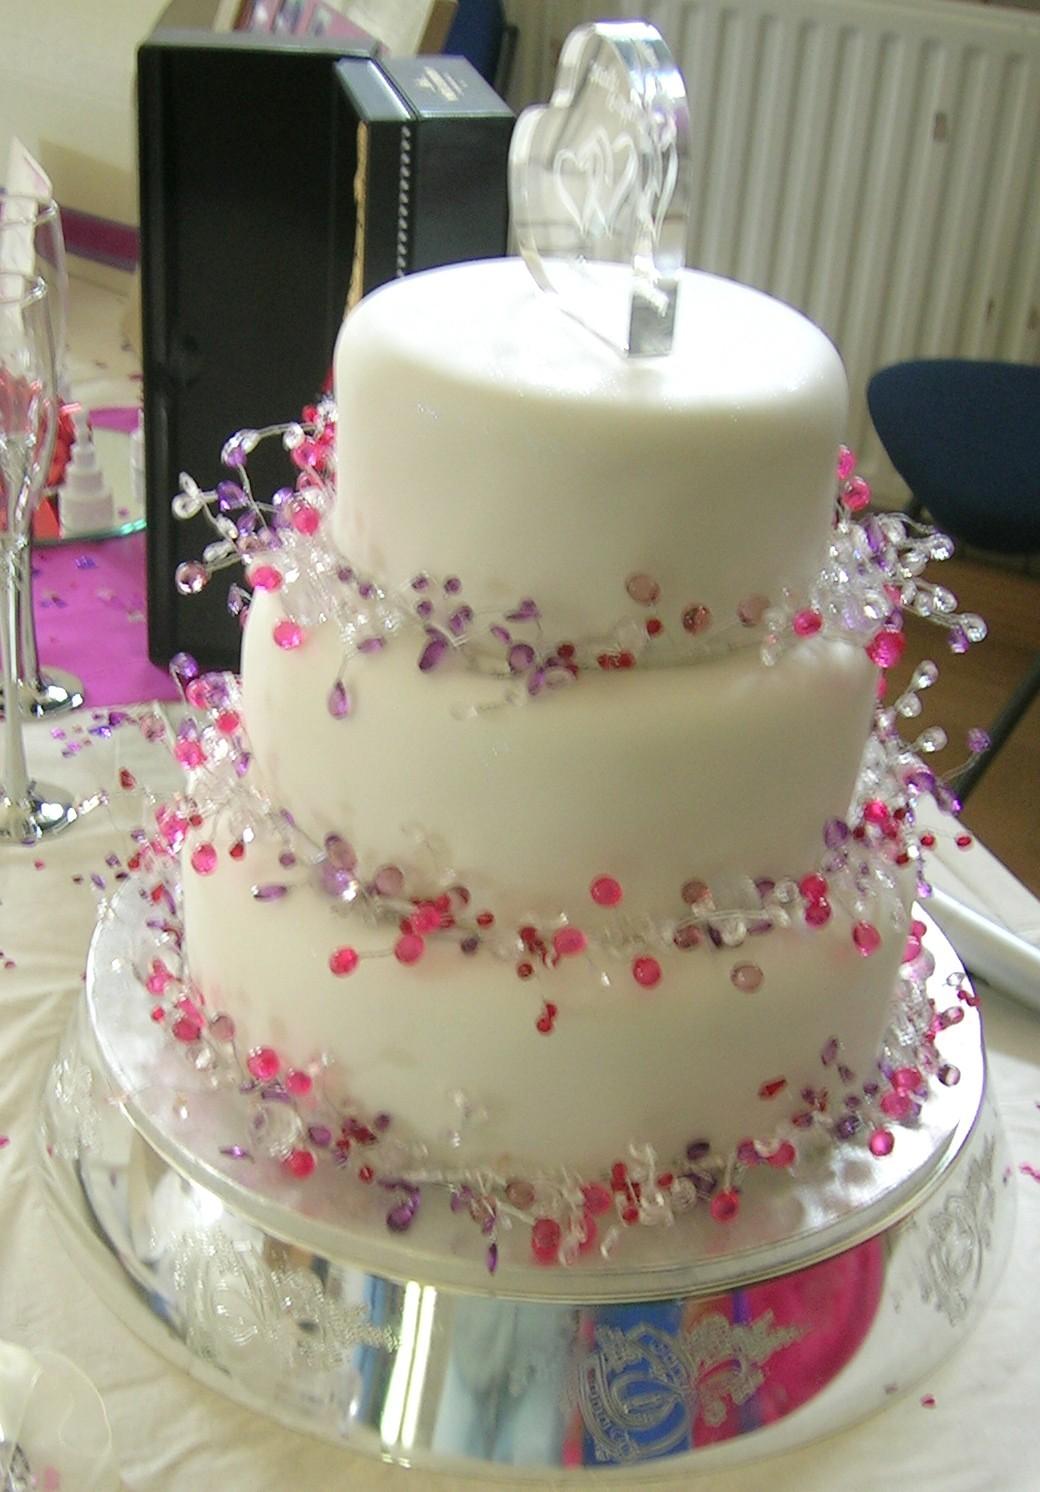 Copy-of-Wedding-Cake-Decorating-Ideas Wonderful ideas for decorating your wedding